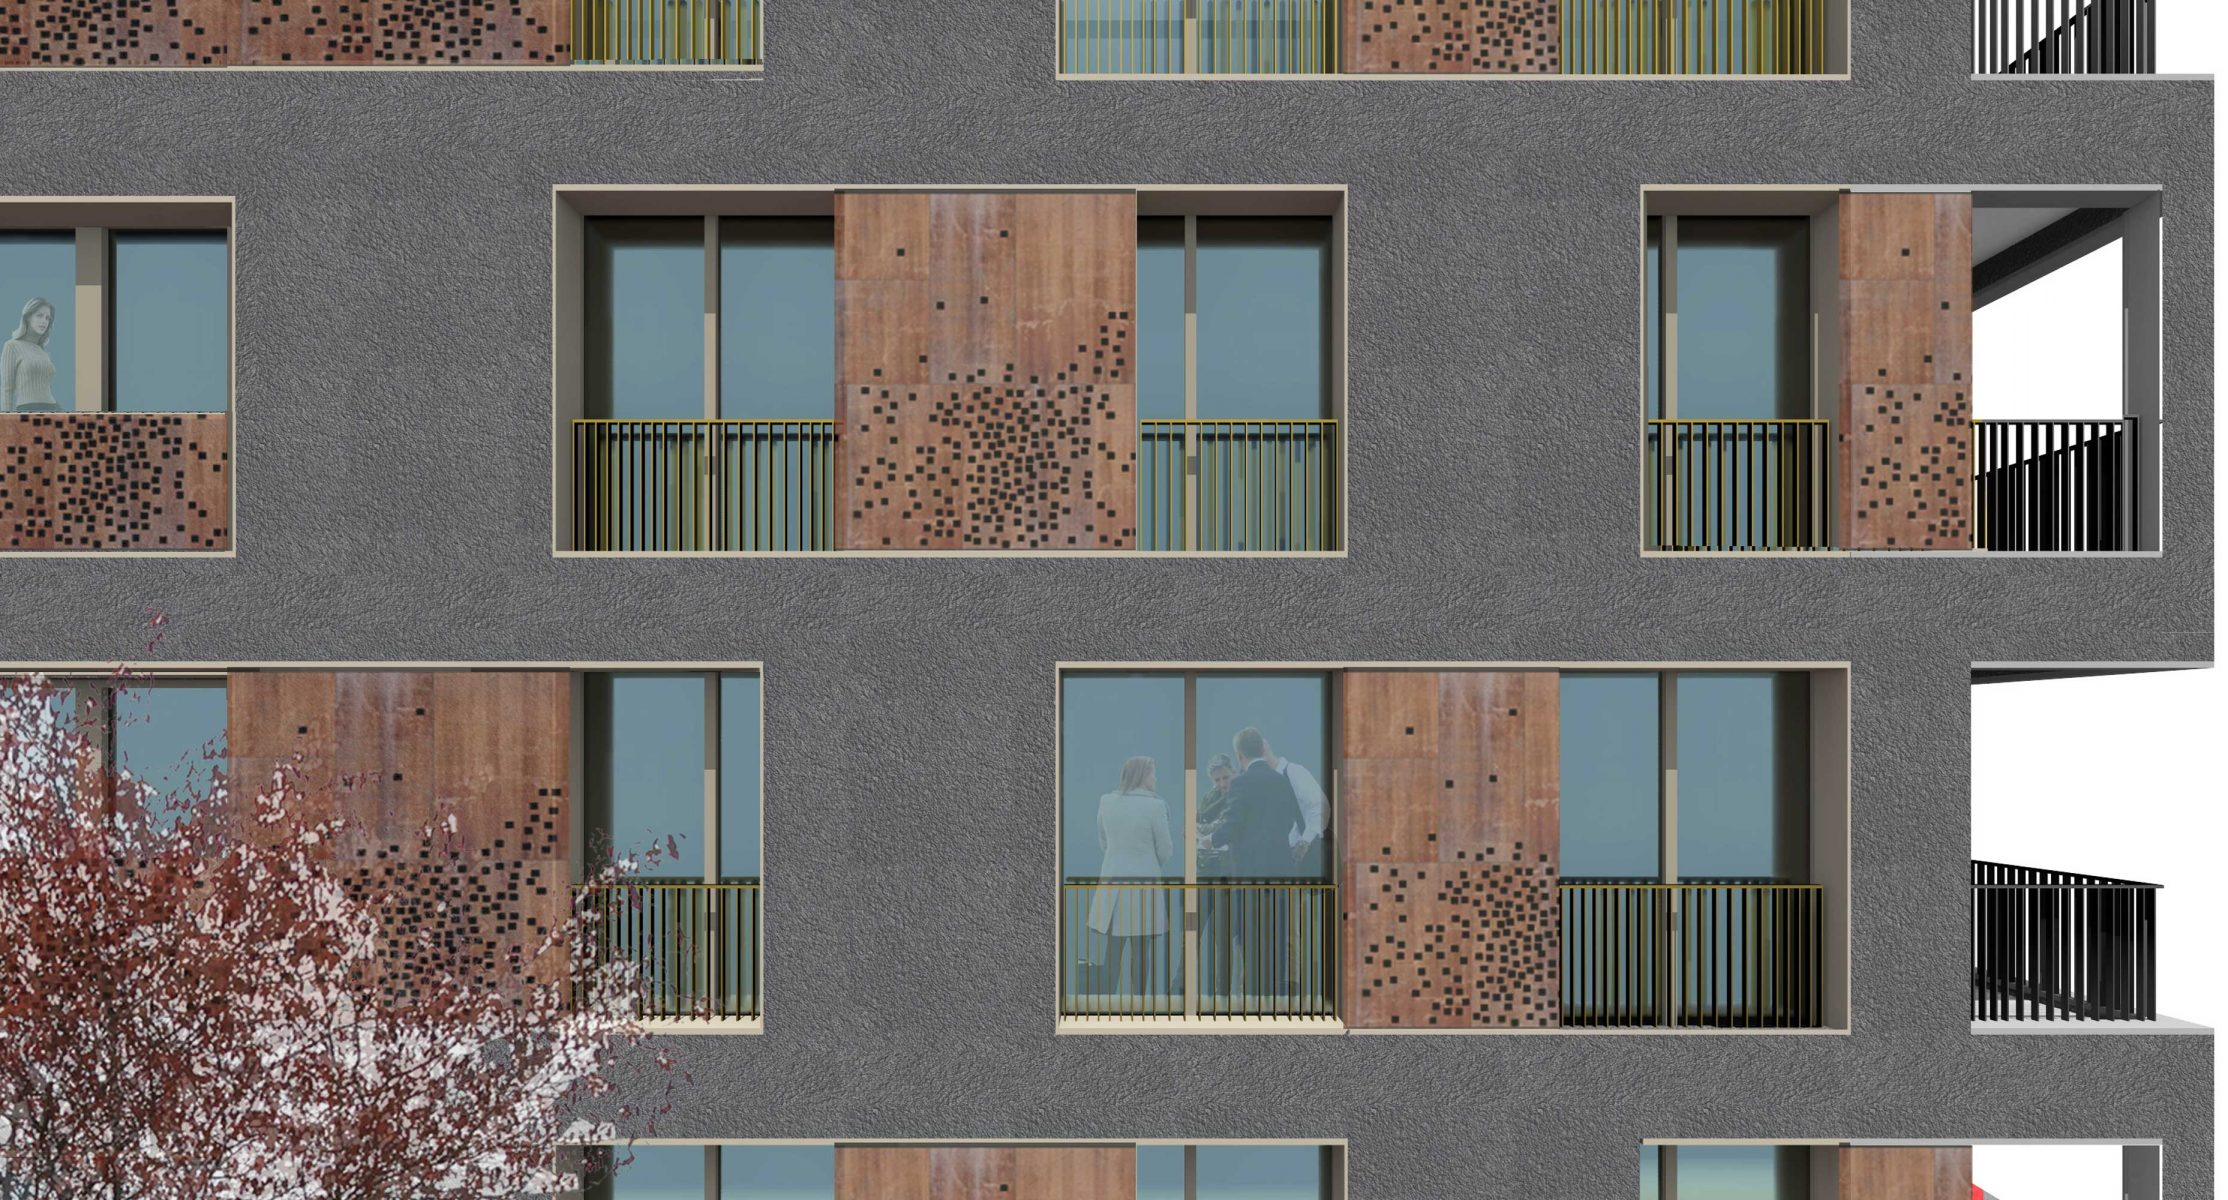 sous-bois-detail-facade